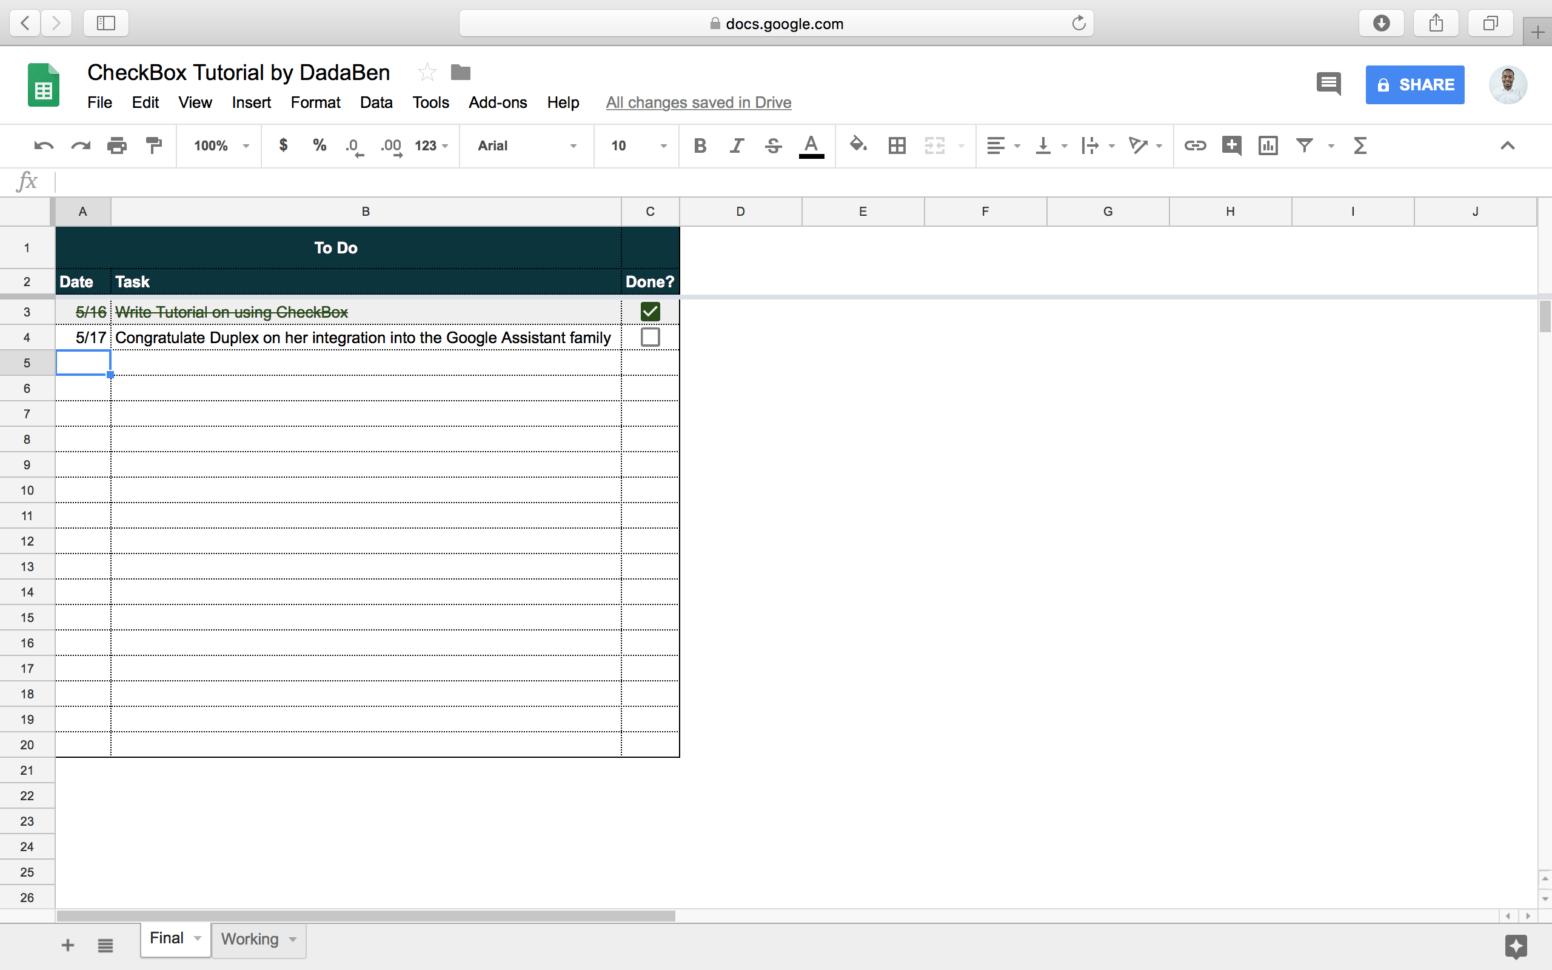 Https Docs Google Com Spreadsheets U 0 Google Spreadshee